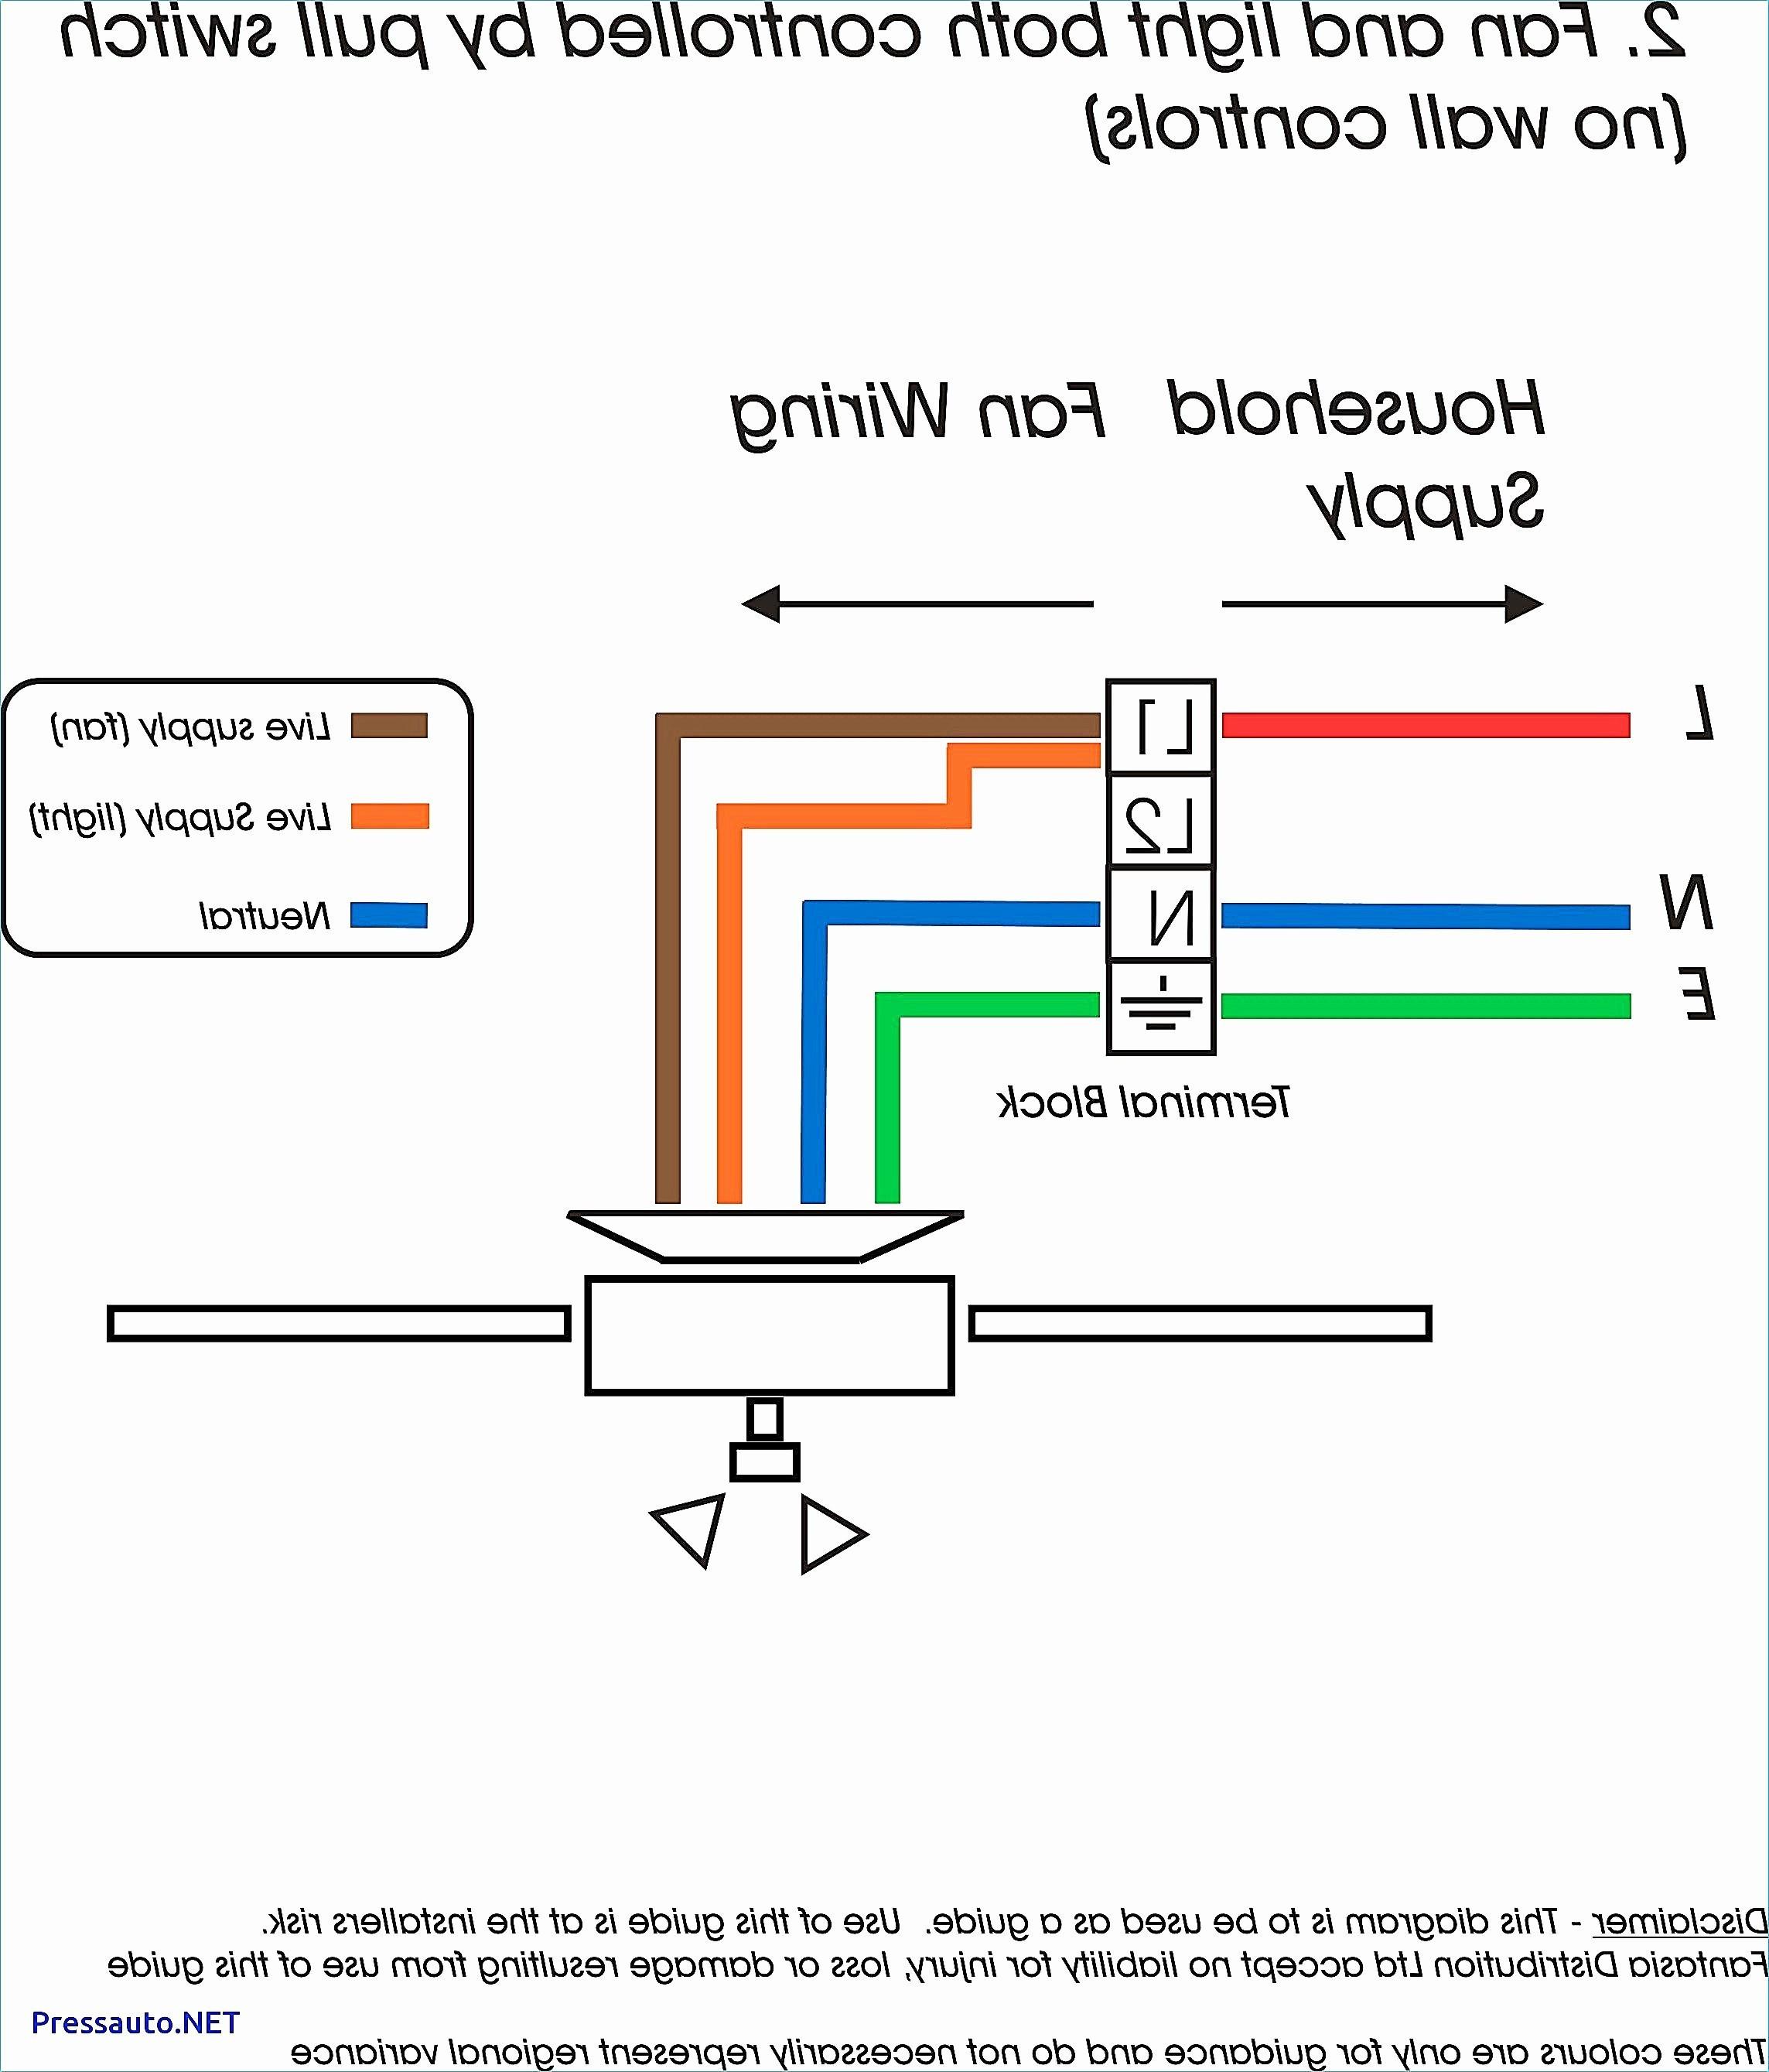 Car Audio Wiring Diagrams Wiring Diagram Car Audio Amplifier Valid Car Audio Wiring Diagrams Of Car Audio Wiring Diagrams